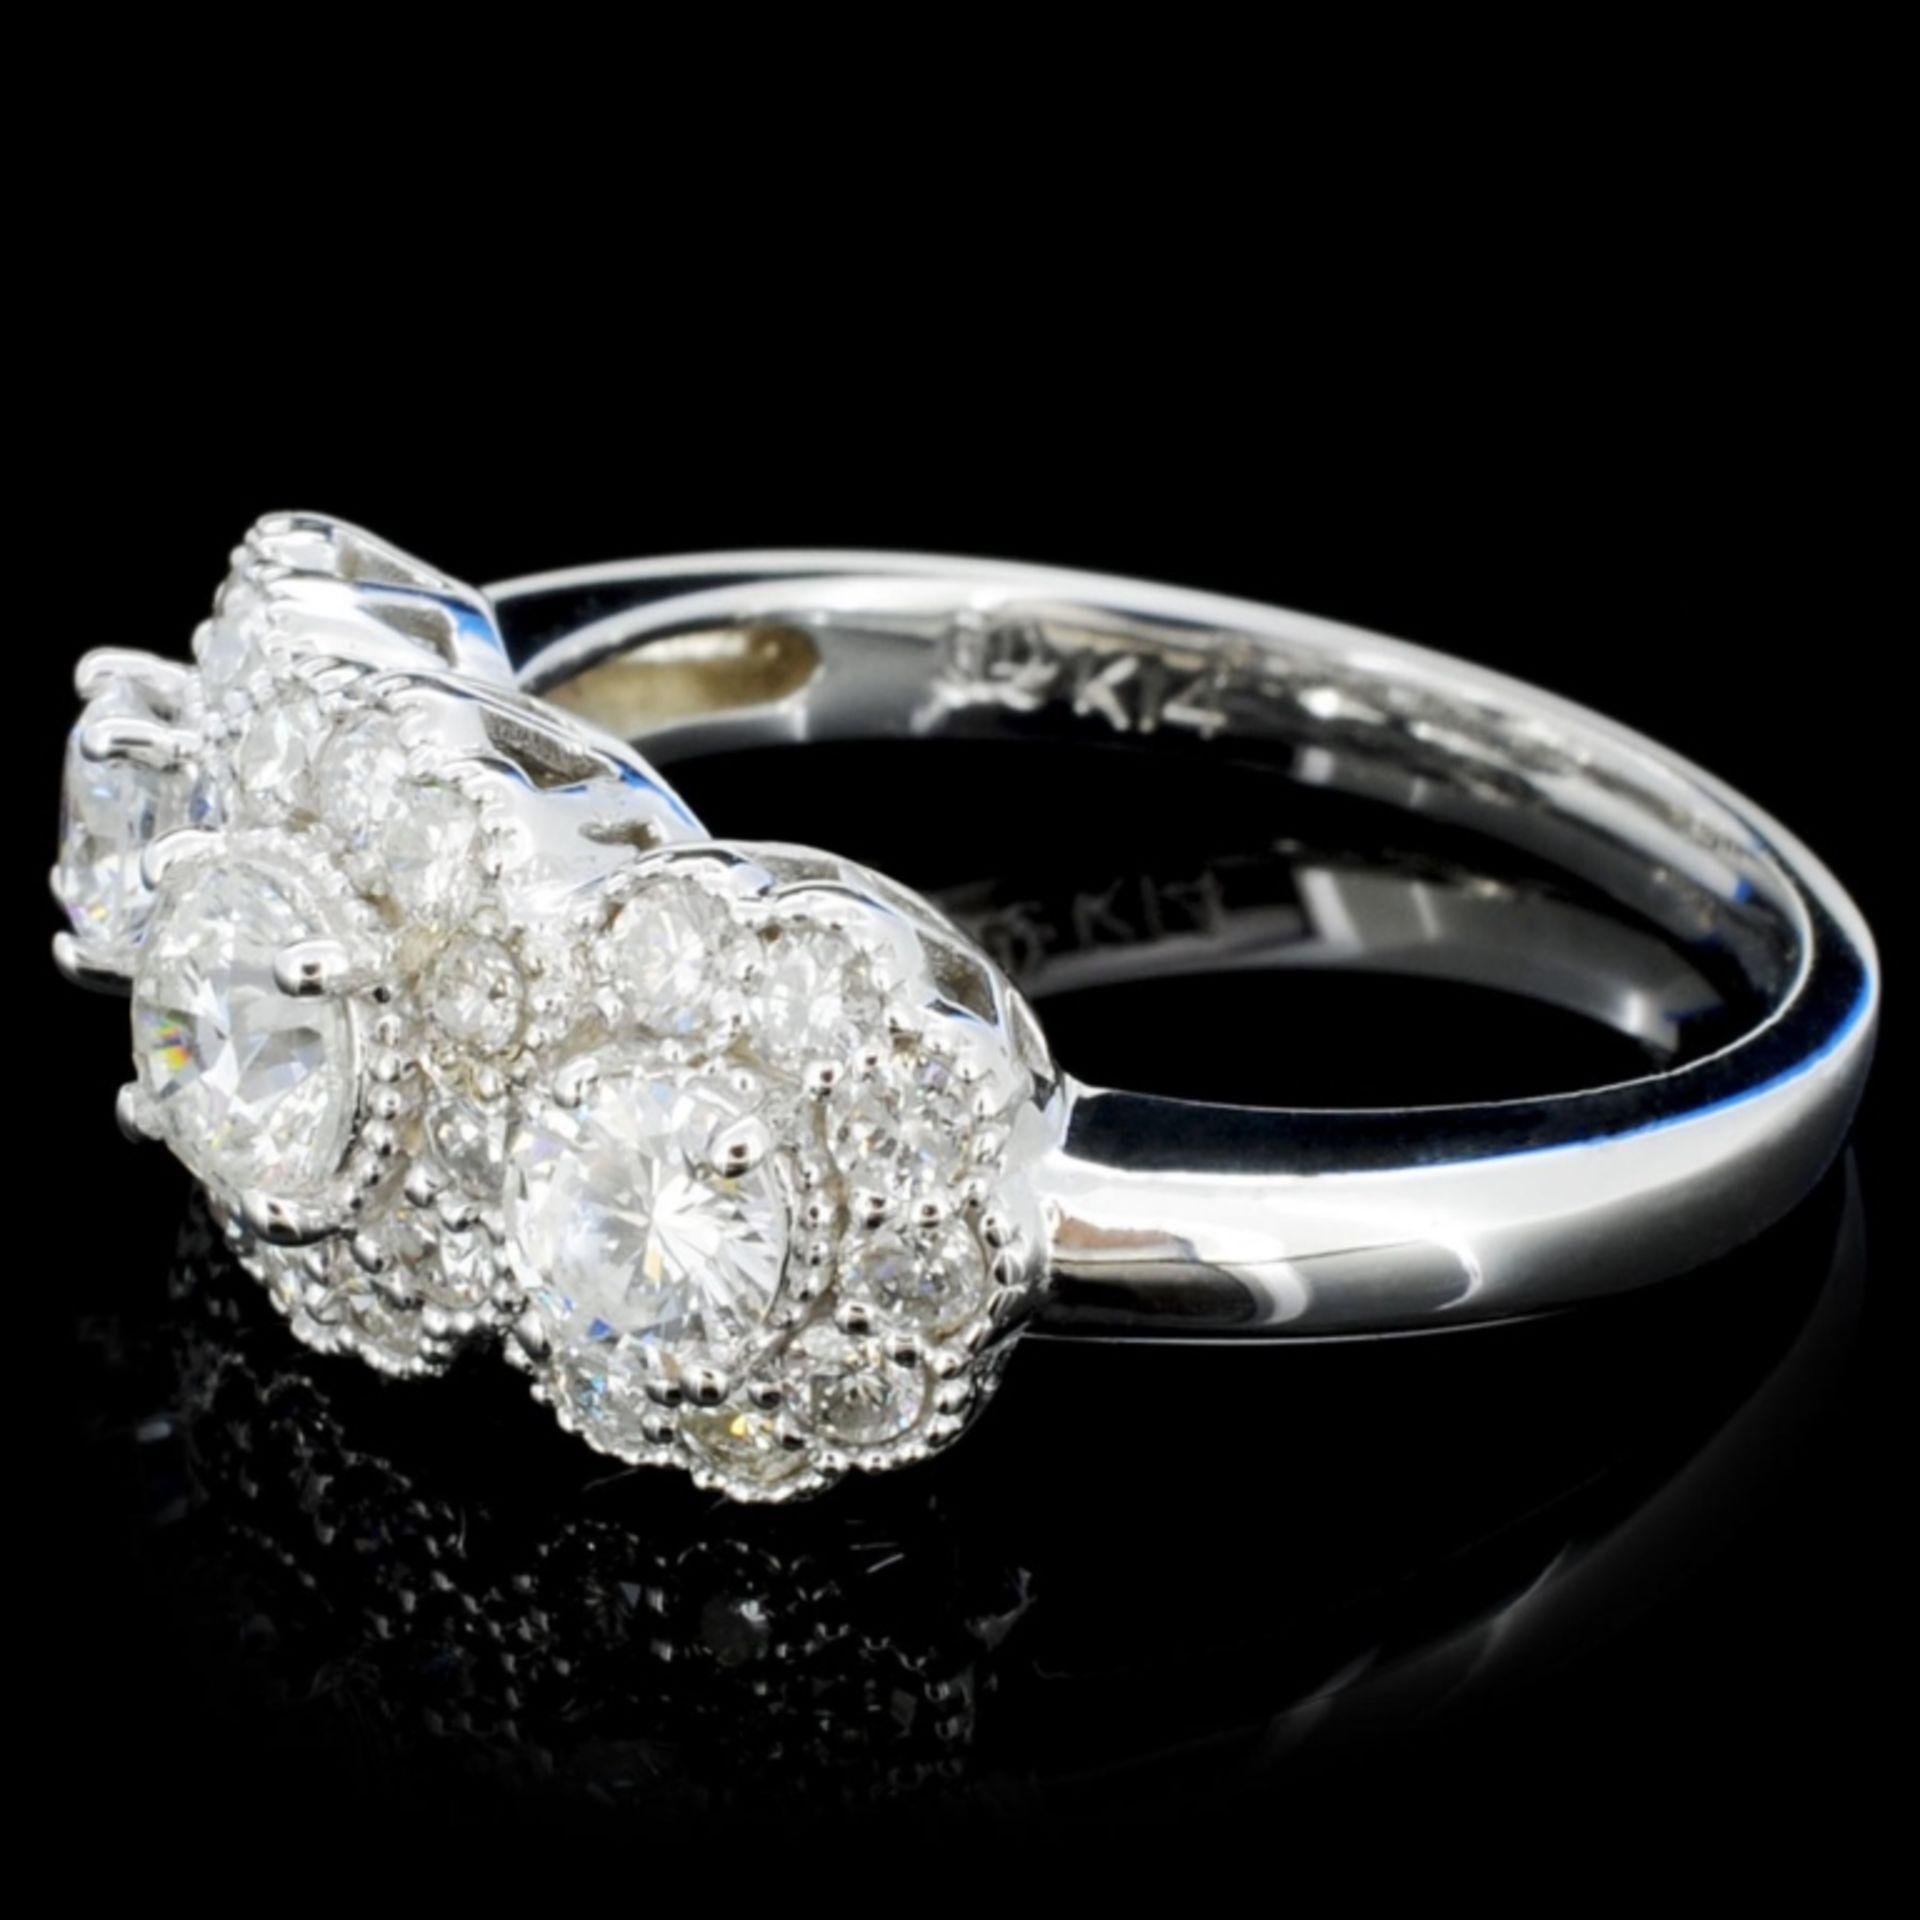 14K Gold 1.20ctw Diamond Ring - Image 3 of 4